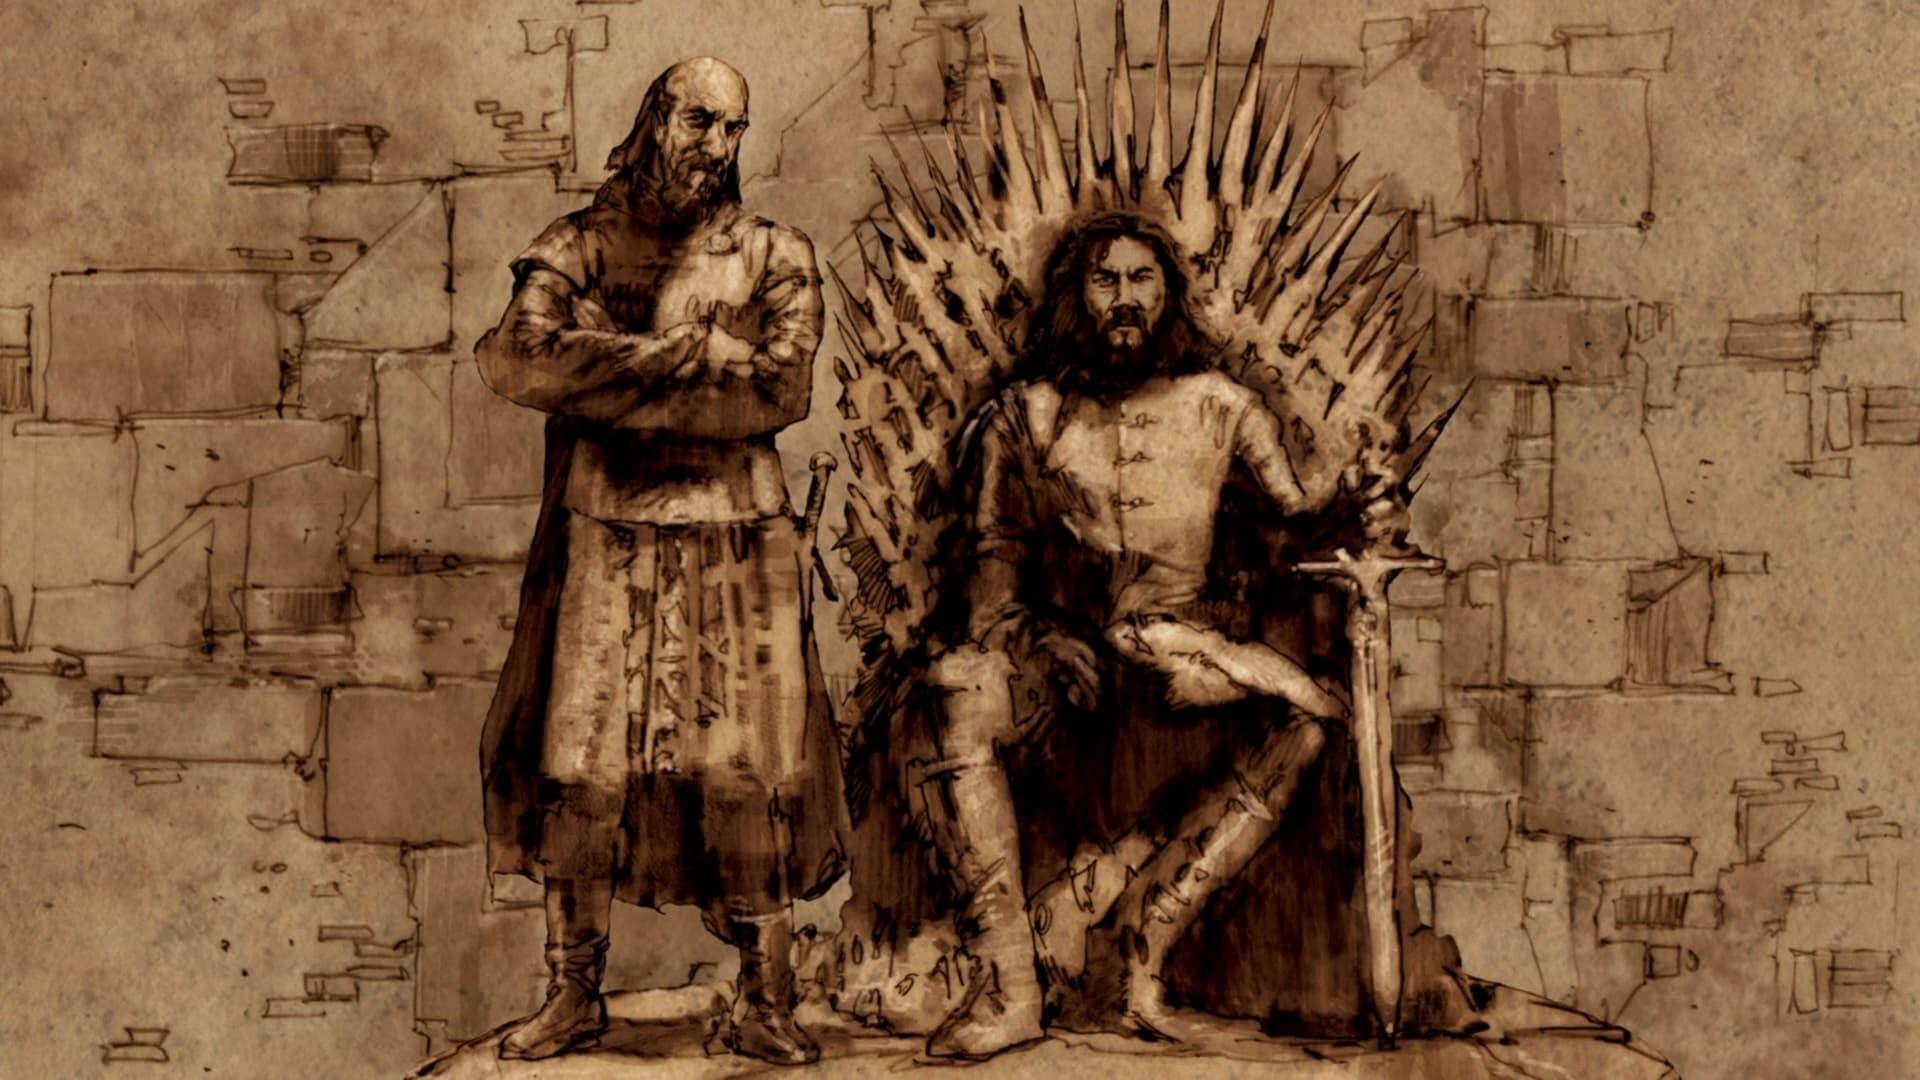 Game of Thrones Season 0 :Episode 72  Histories & Lore: The Sack of King's Landing (Robert Baratheon)